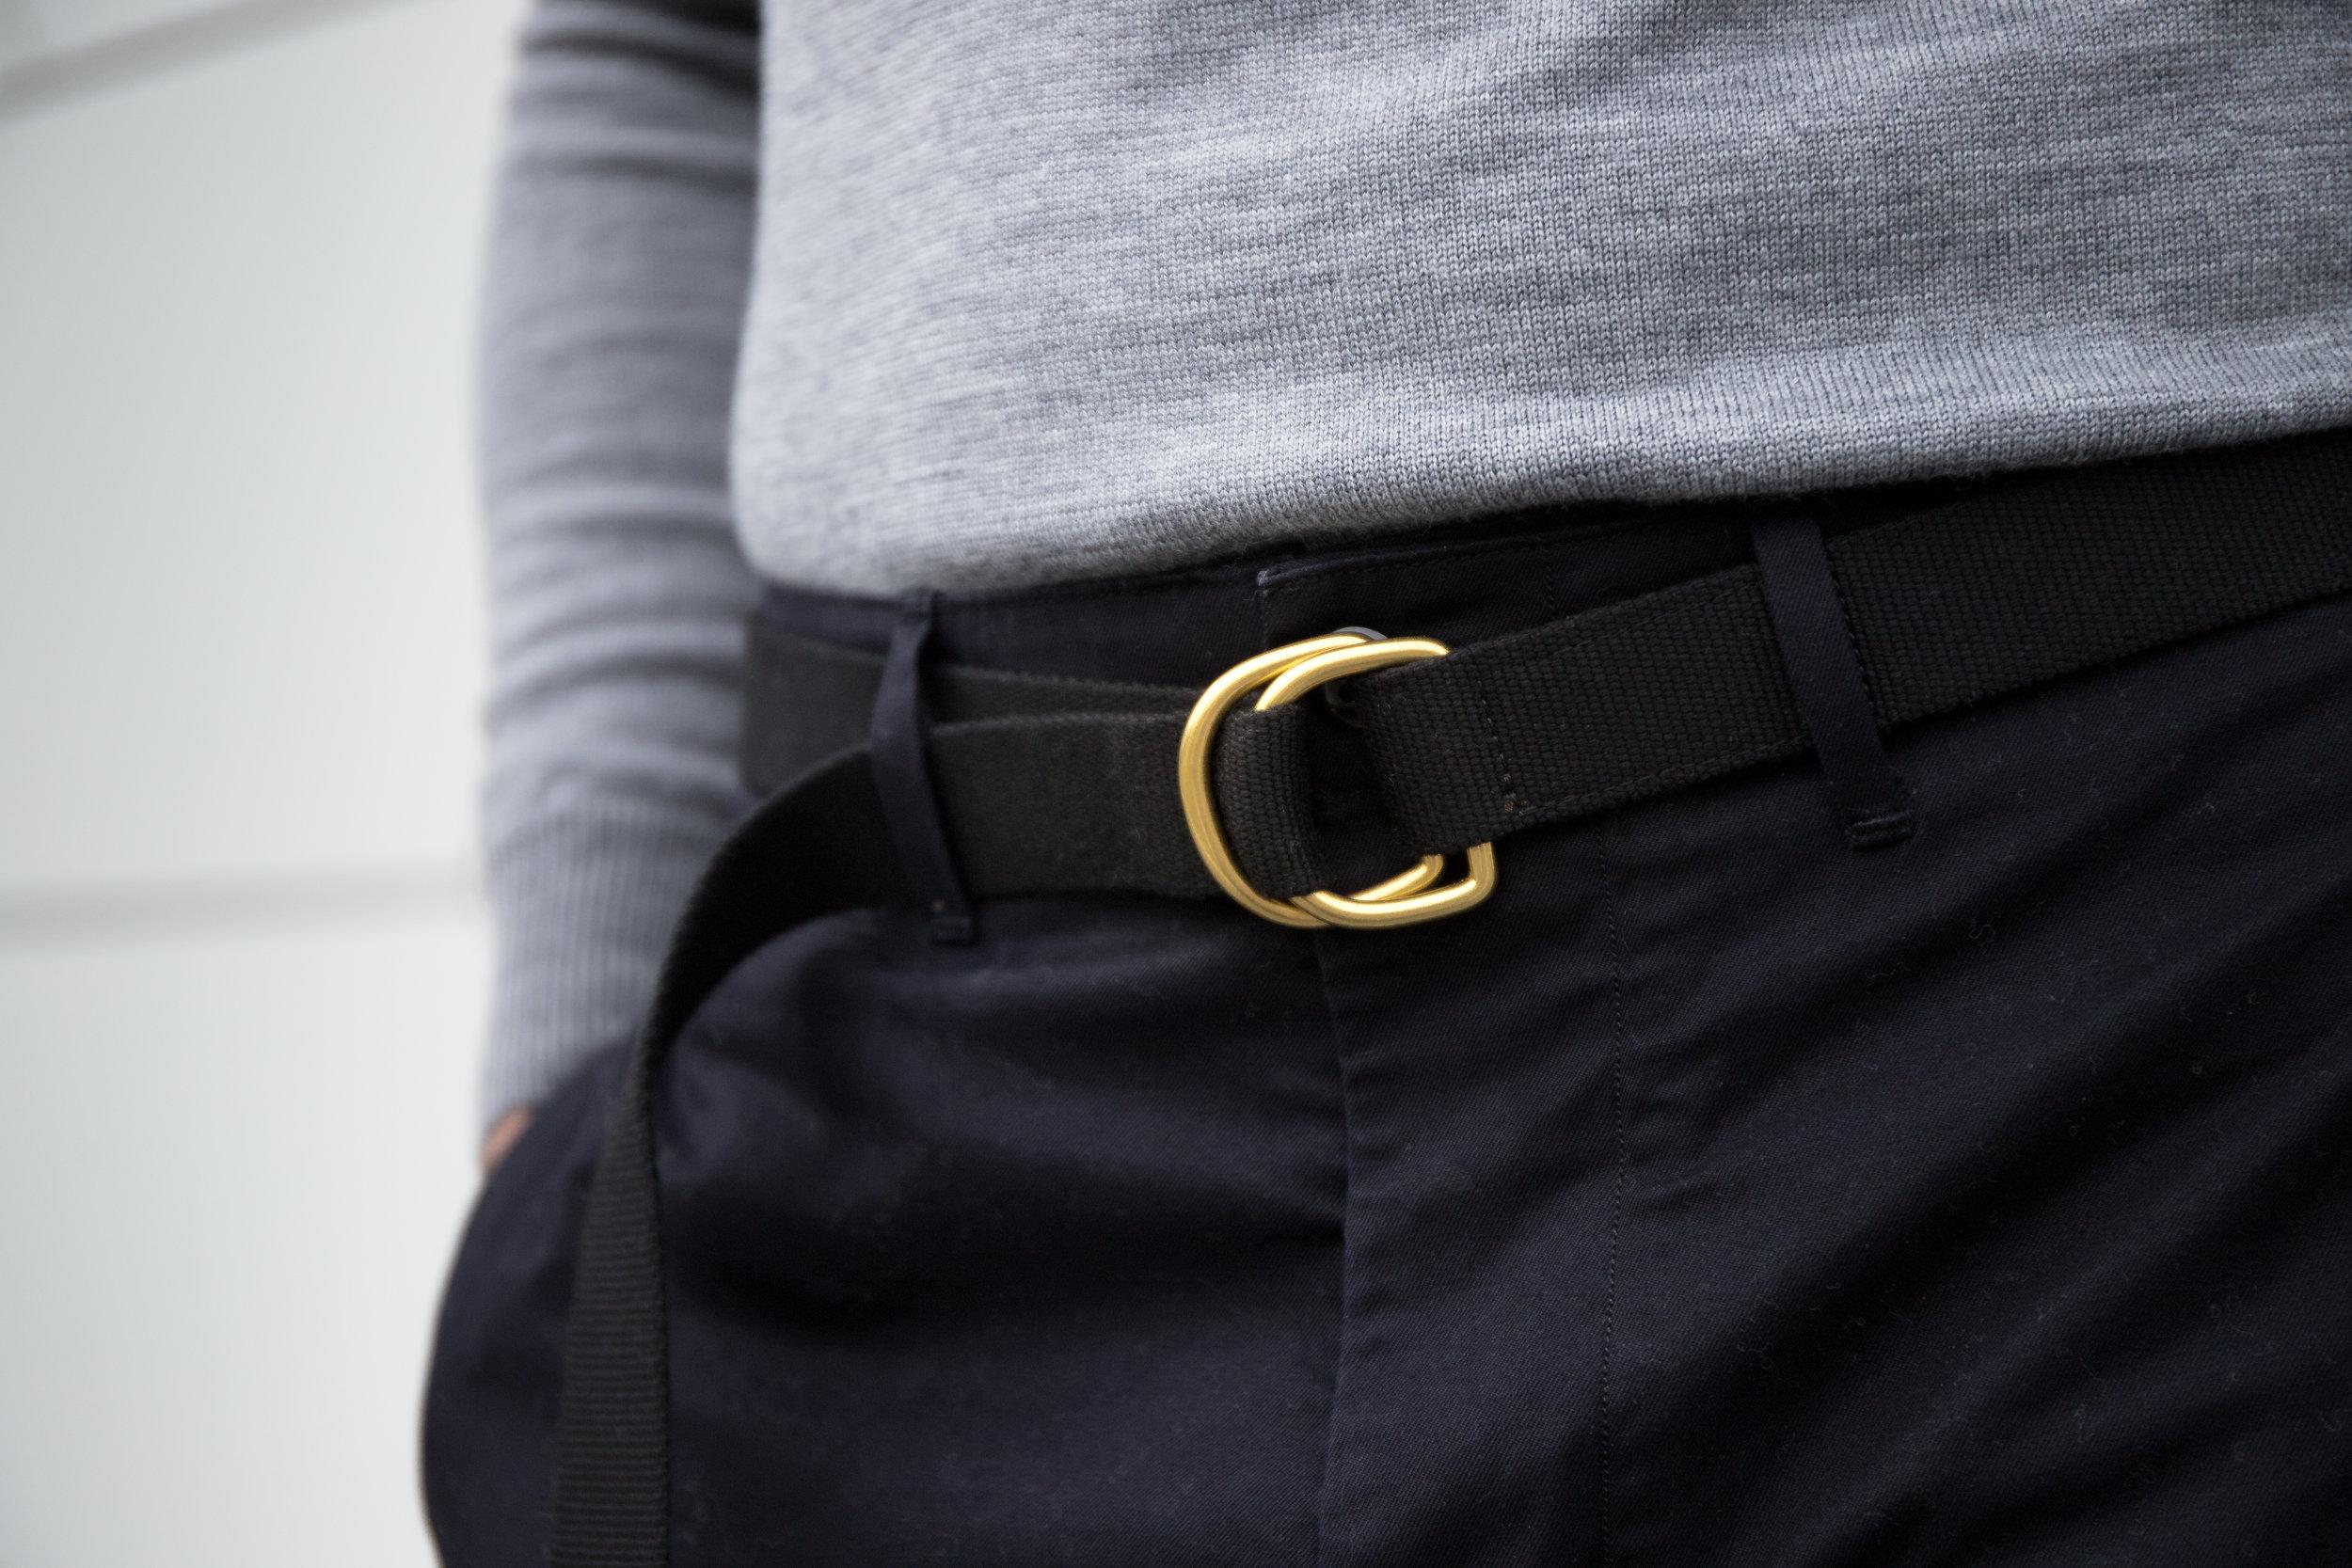 Belt: Dyemond Goods Woven belt //Top:  Dilor knitted turtle neck //Pants:  Bellerose Plano